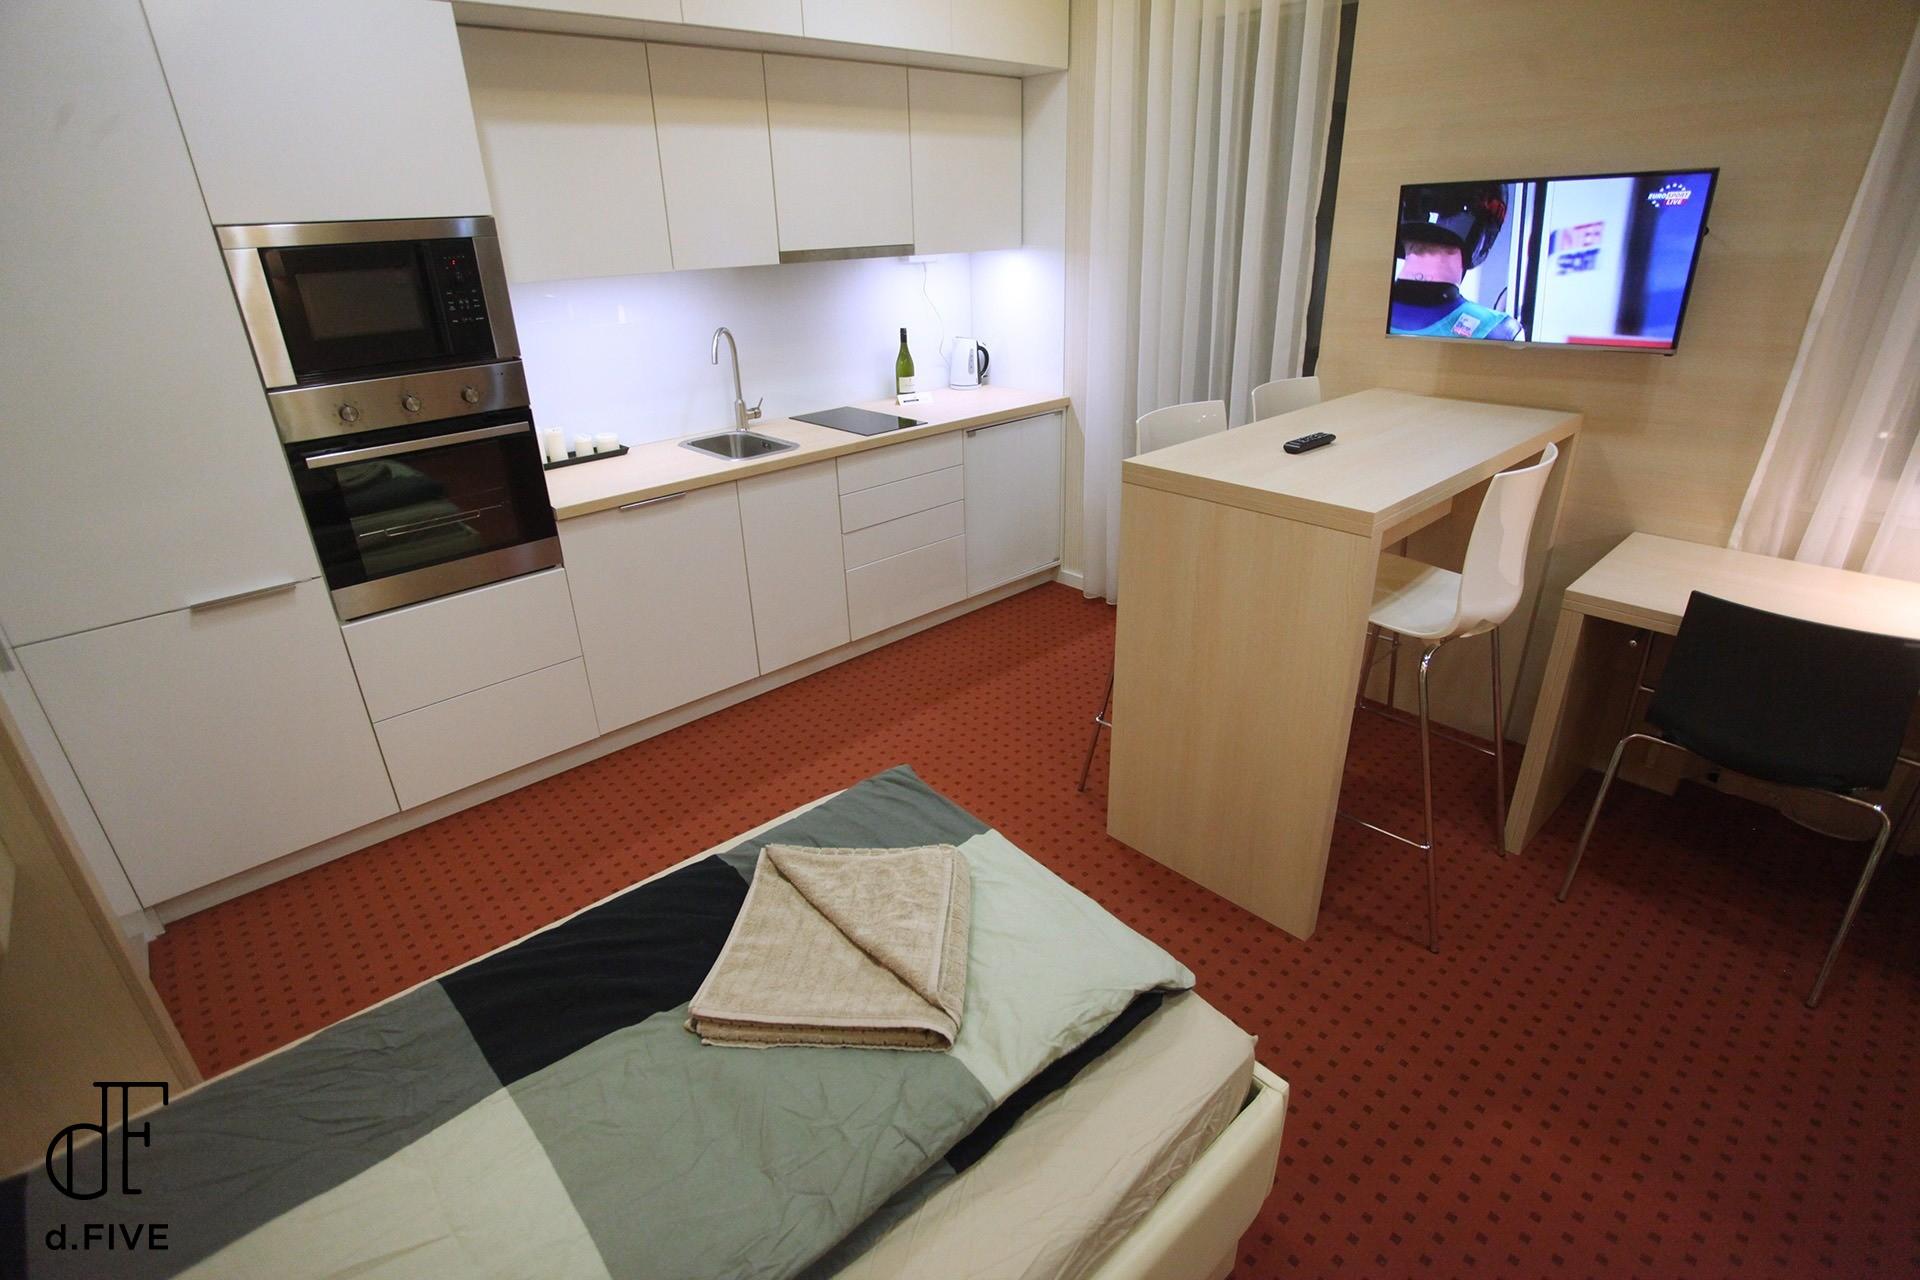 d.FIVE Apartment Marek József